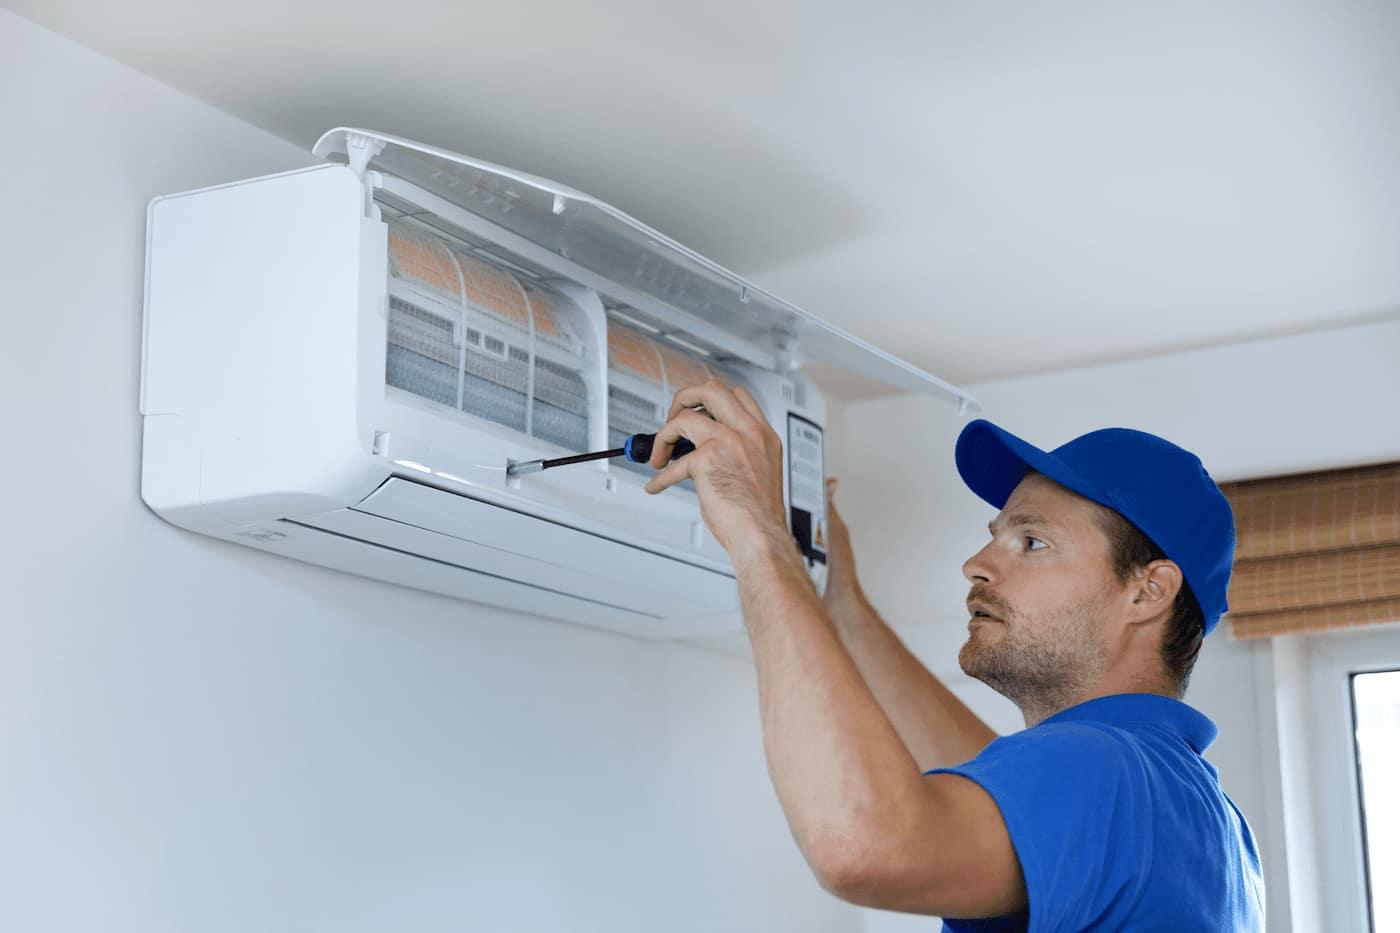 Maintenance on HVAC unit and costs